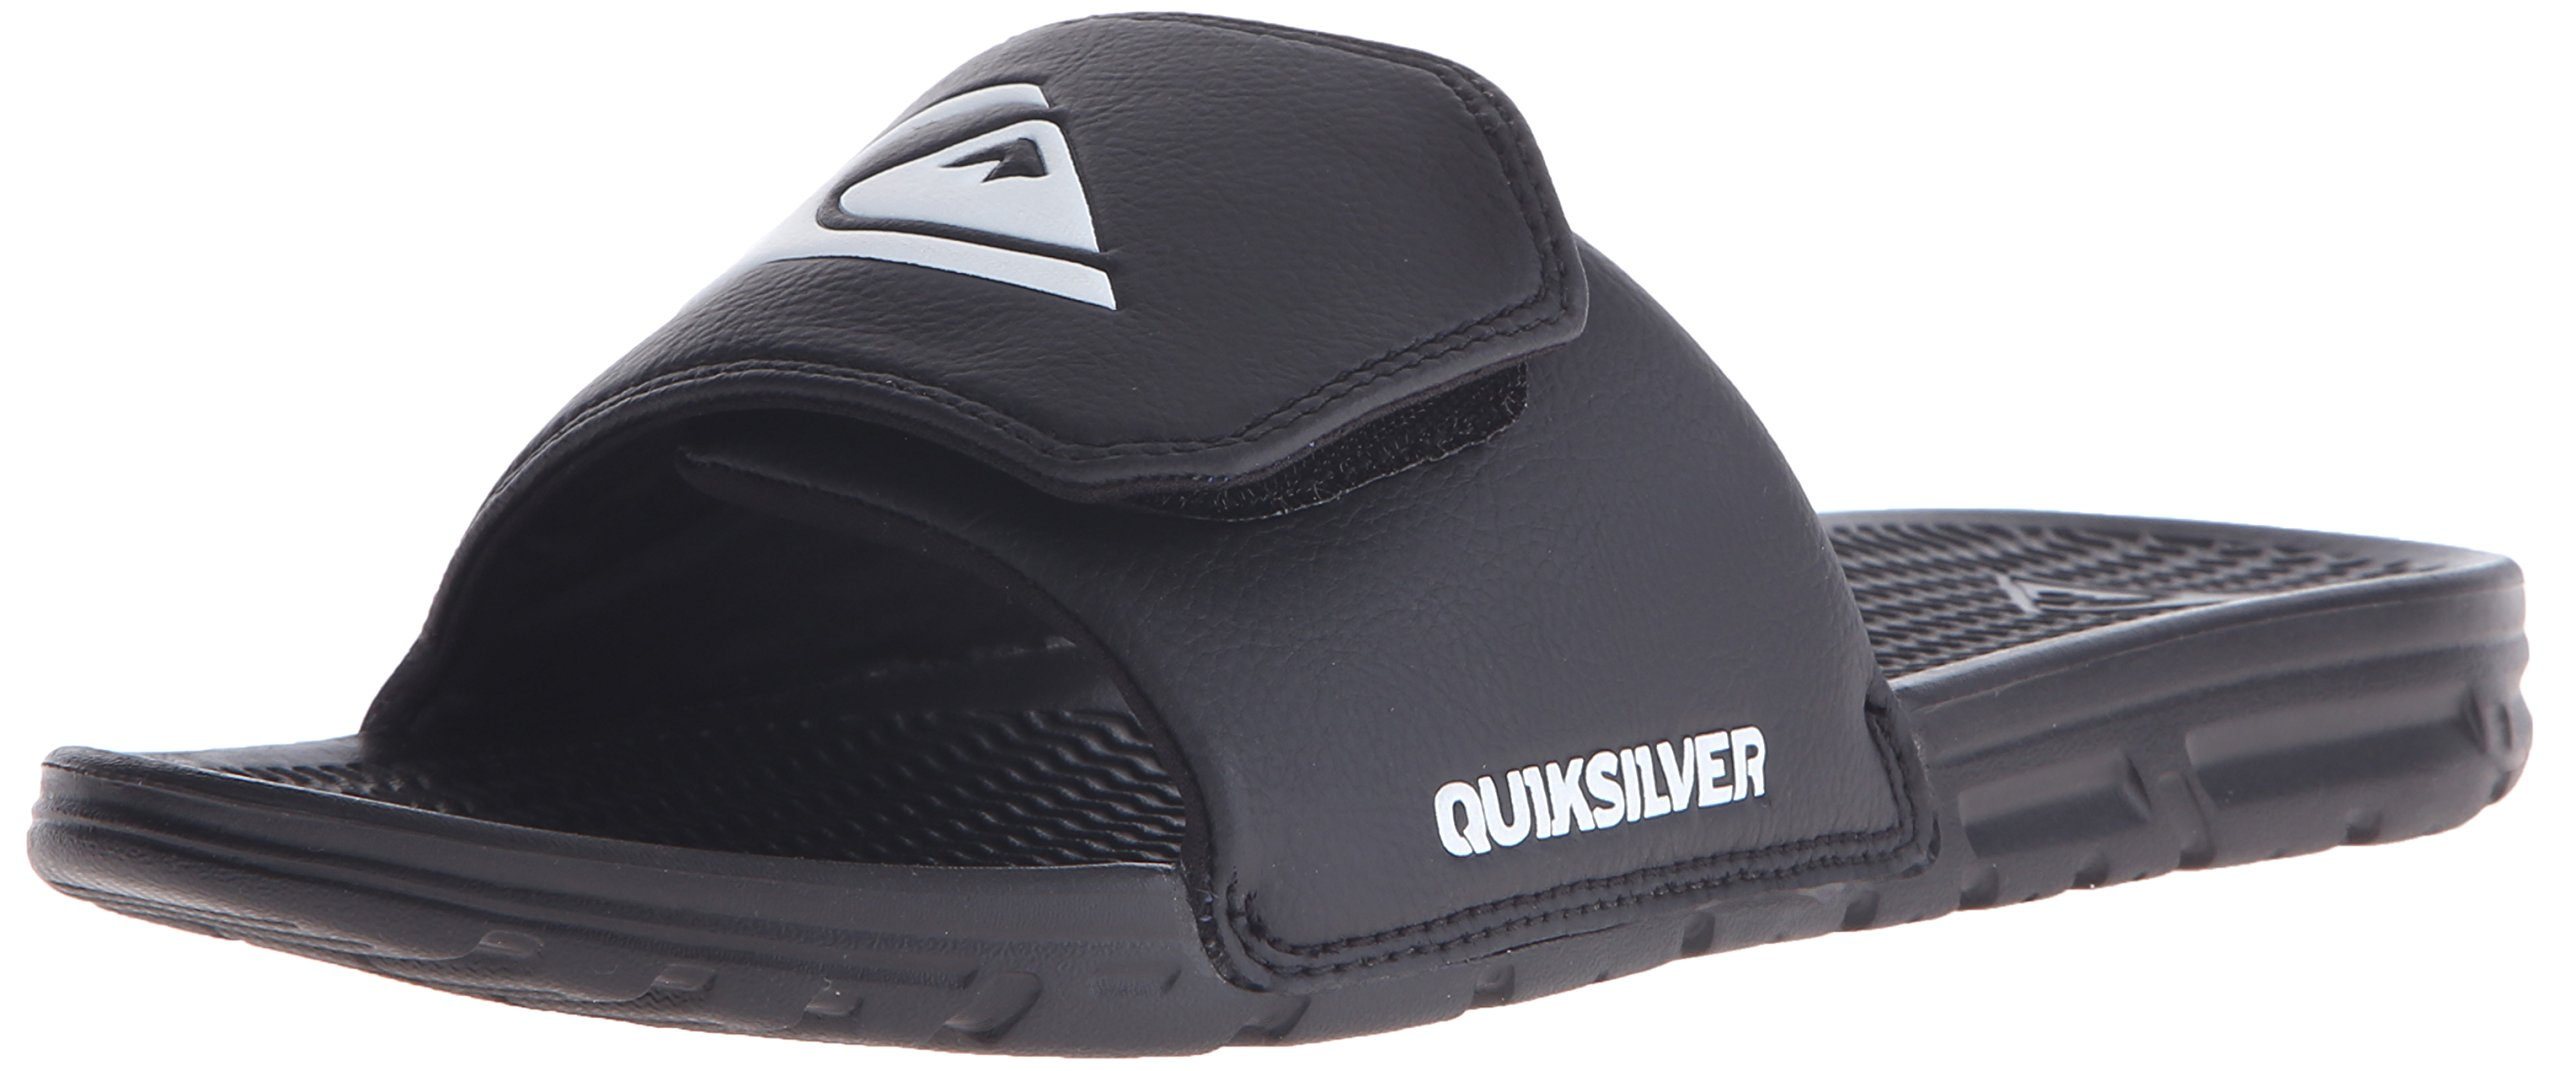 Quiksilver Men's Shoreline Adjust Sandal, Black/Black/White, 7 M US